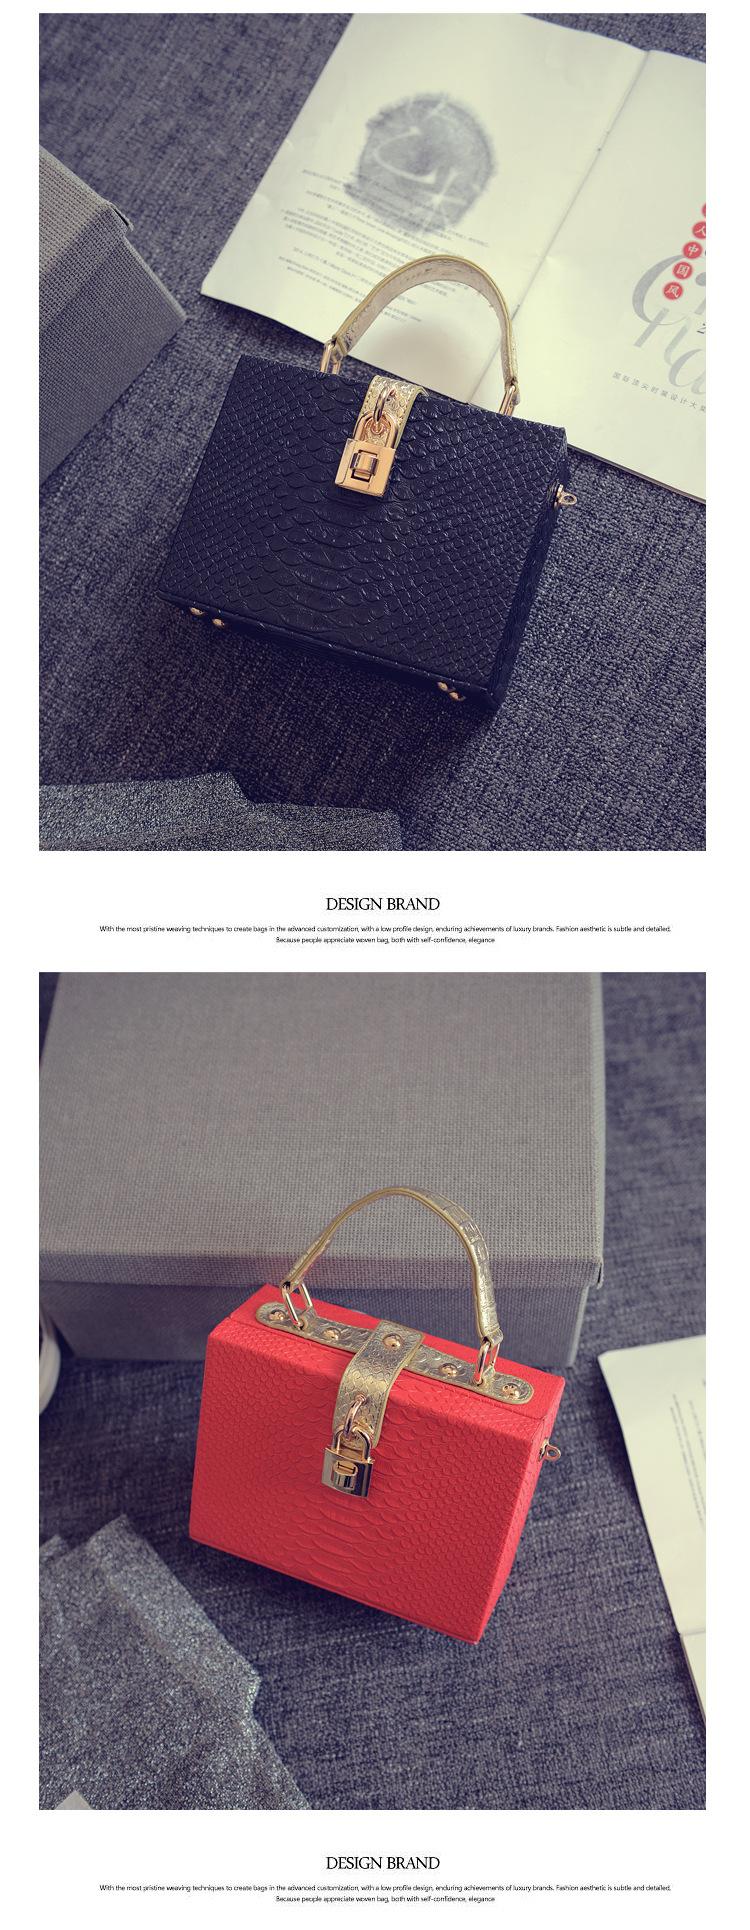 Women's European and American Style Handbags 2016 New Lady Messenger bag Shoulder Bags PU Leather Handbags Crossbody bag